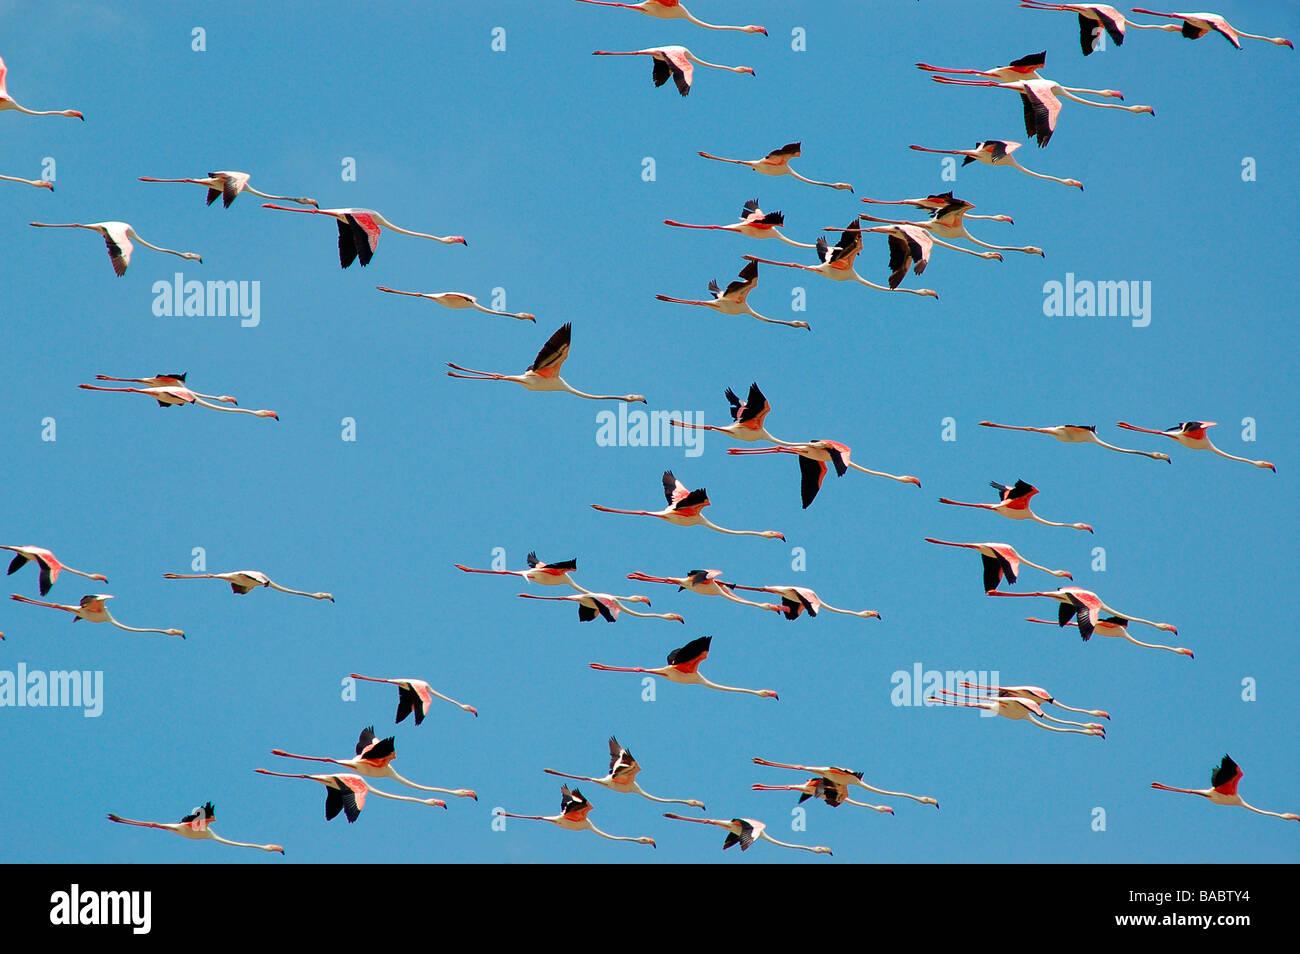 Flamingoes in flight at koothankulam, Thirunelvelli District, Tamil Nadu - Stock Image